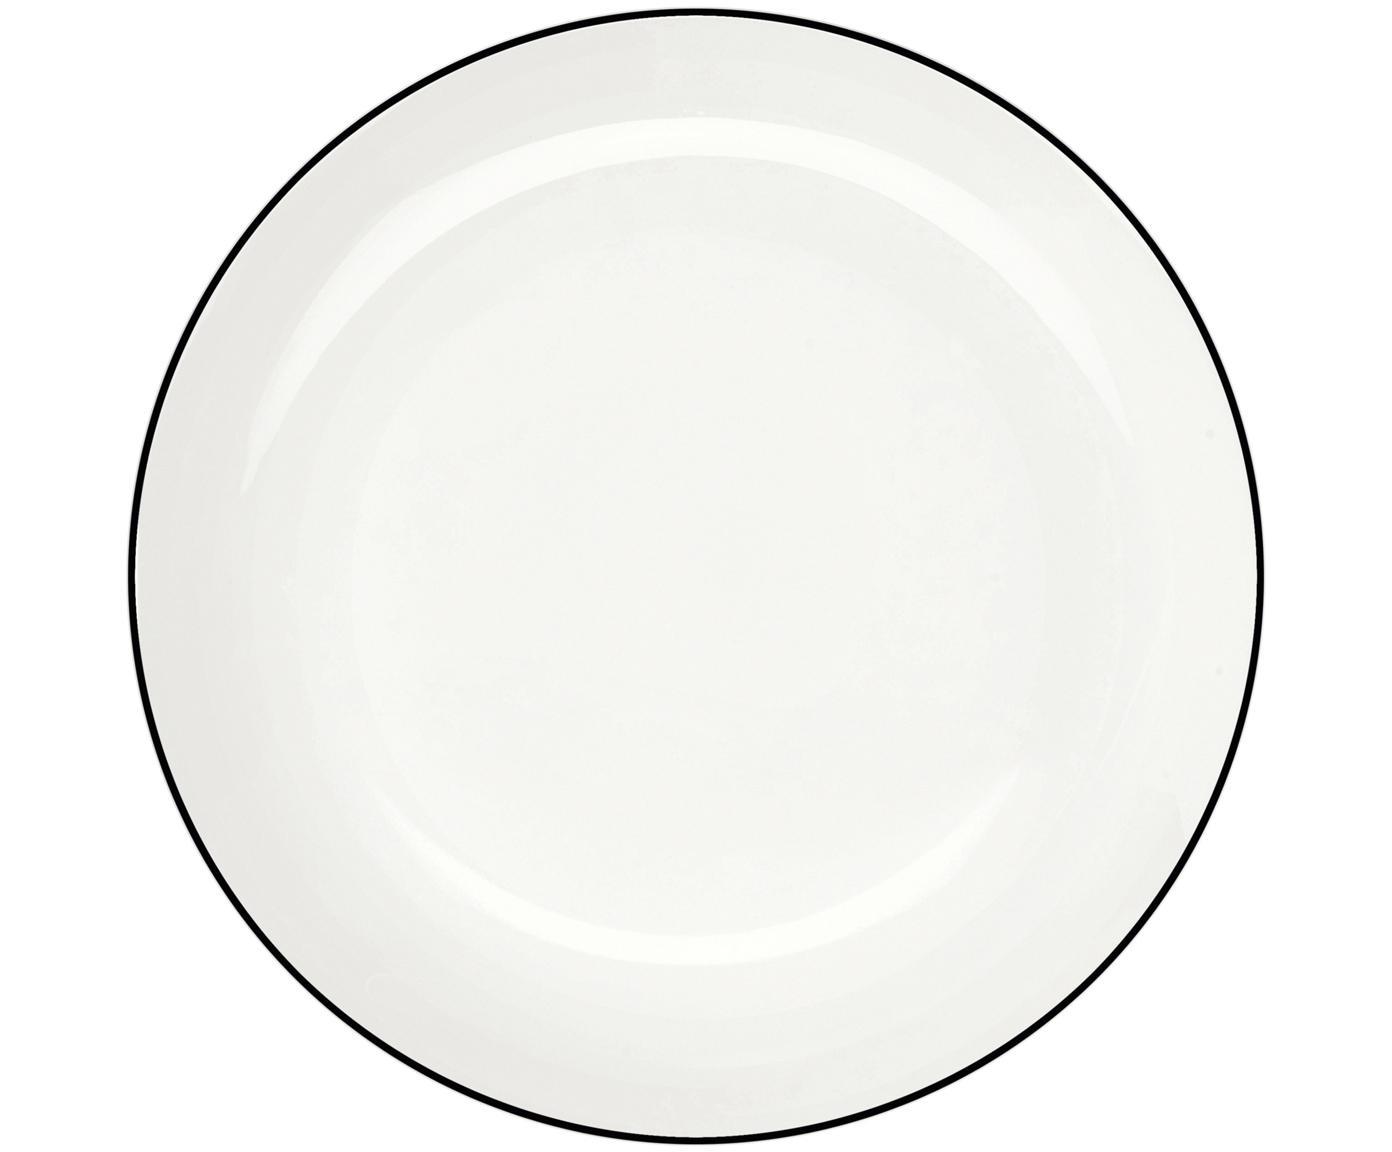 Platos de pasta á table ligne noir, 4uds., Porcelana fina, Blanco Borde: negro, Ø 22 x Al 5 cm